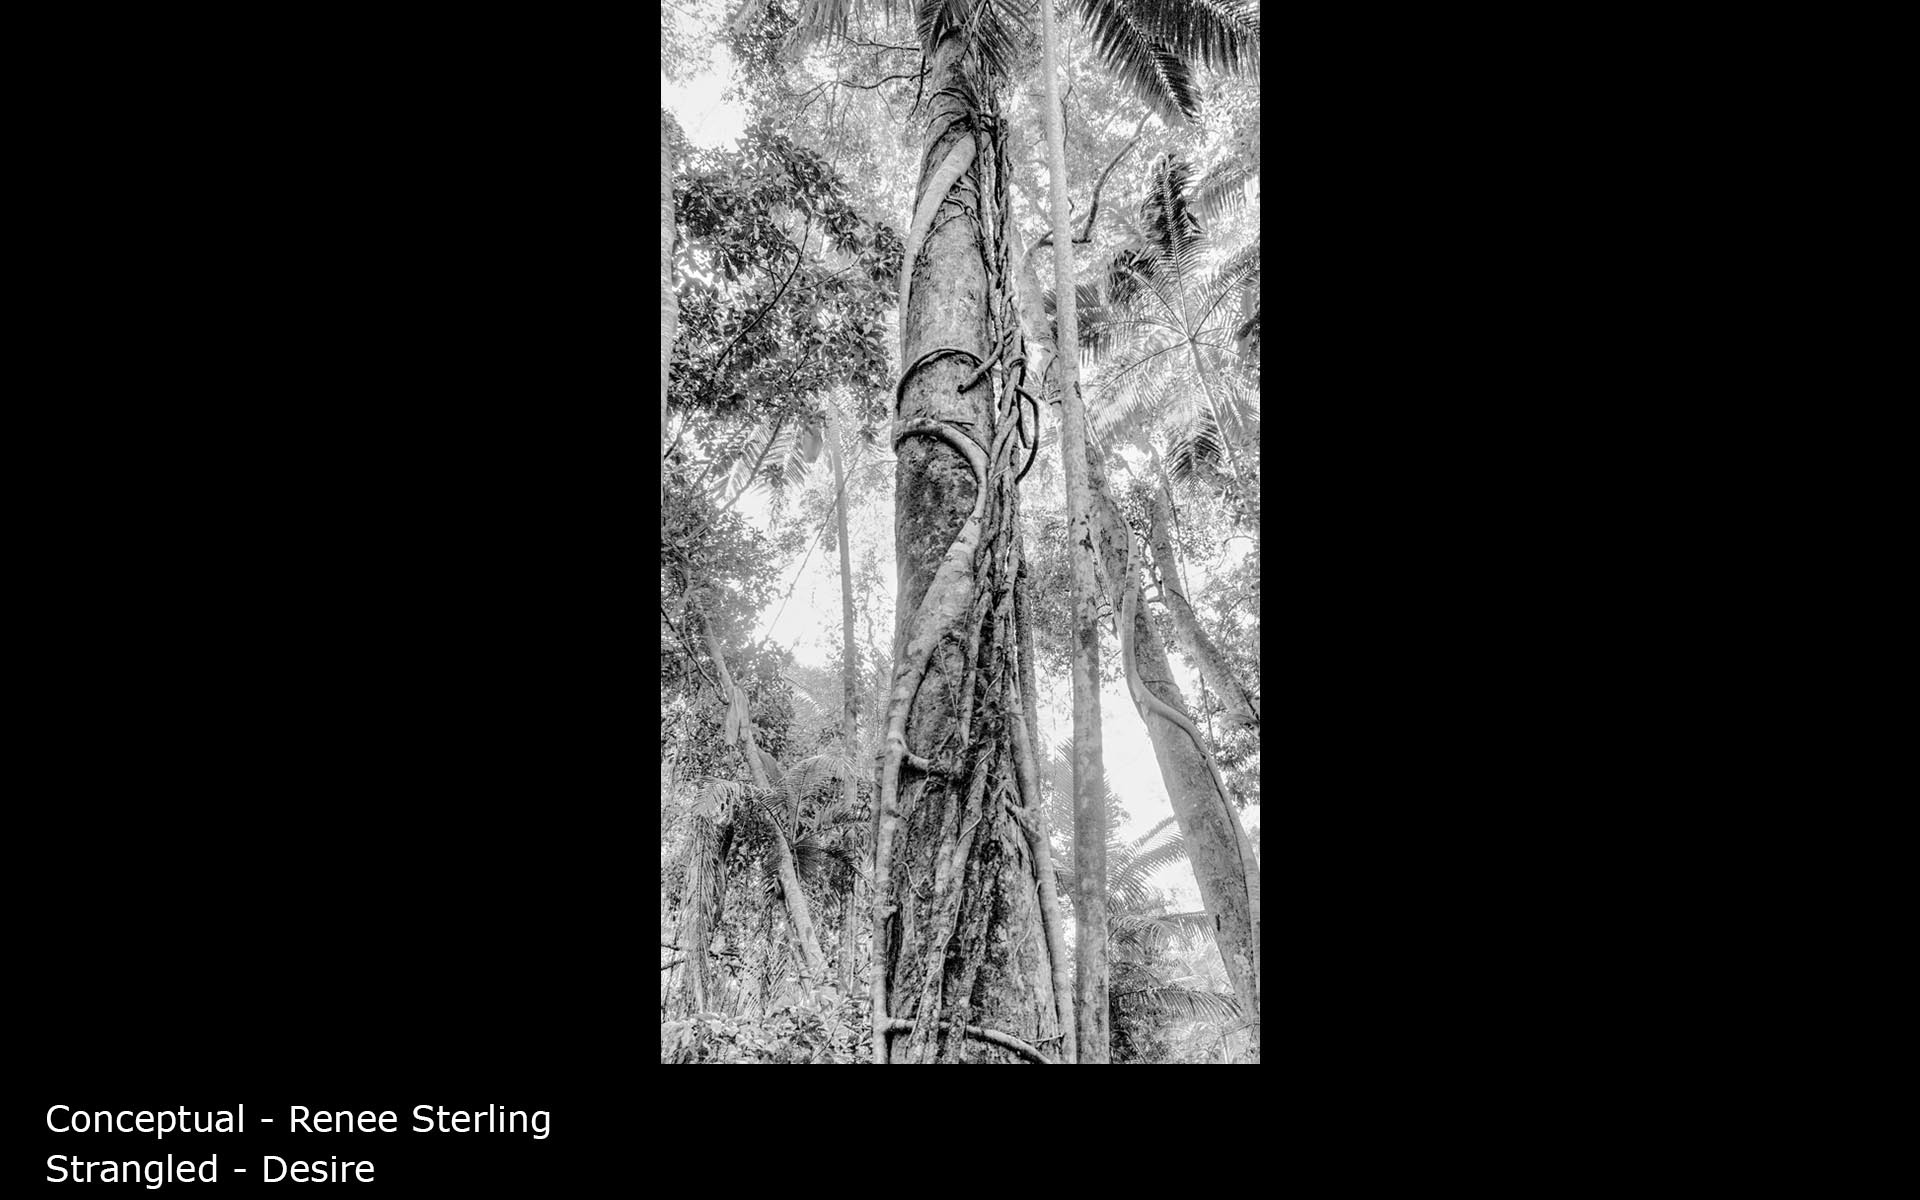 Strangled - Desire - Renee Sterling